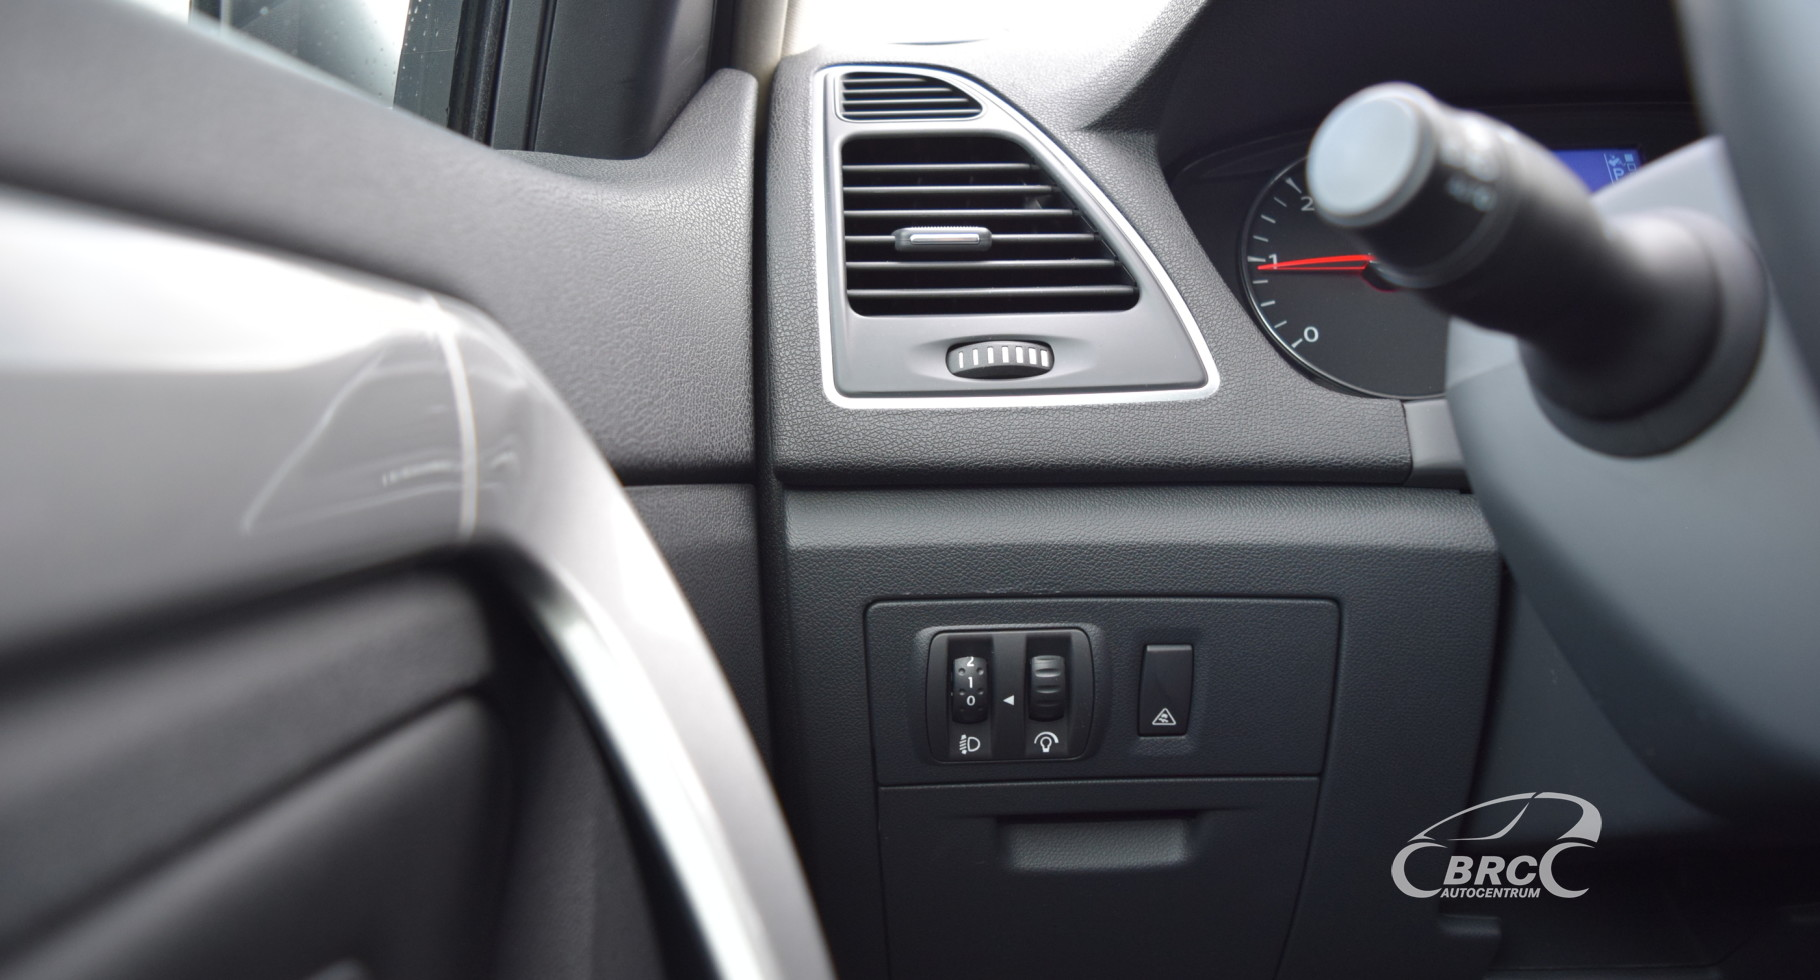 Renault Laguna 4 Control